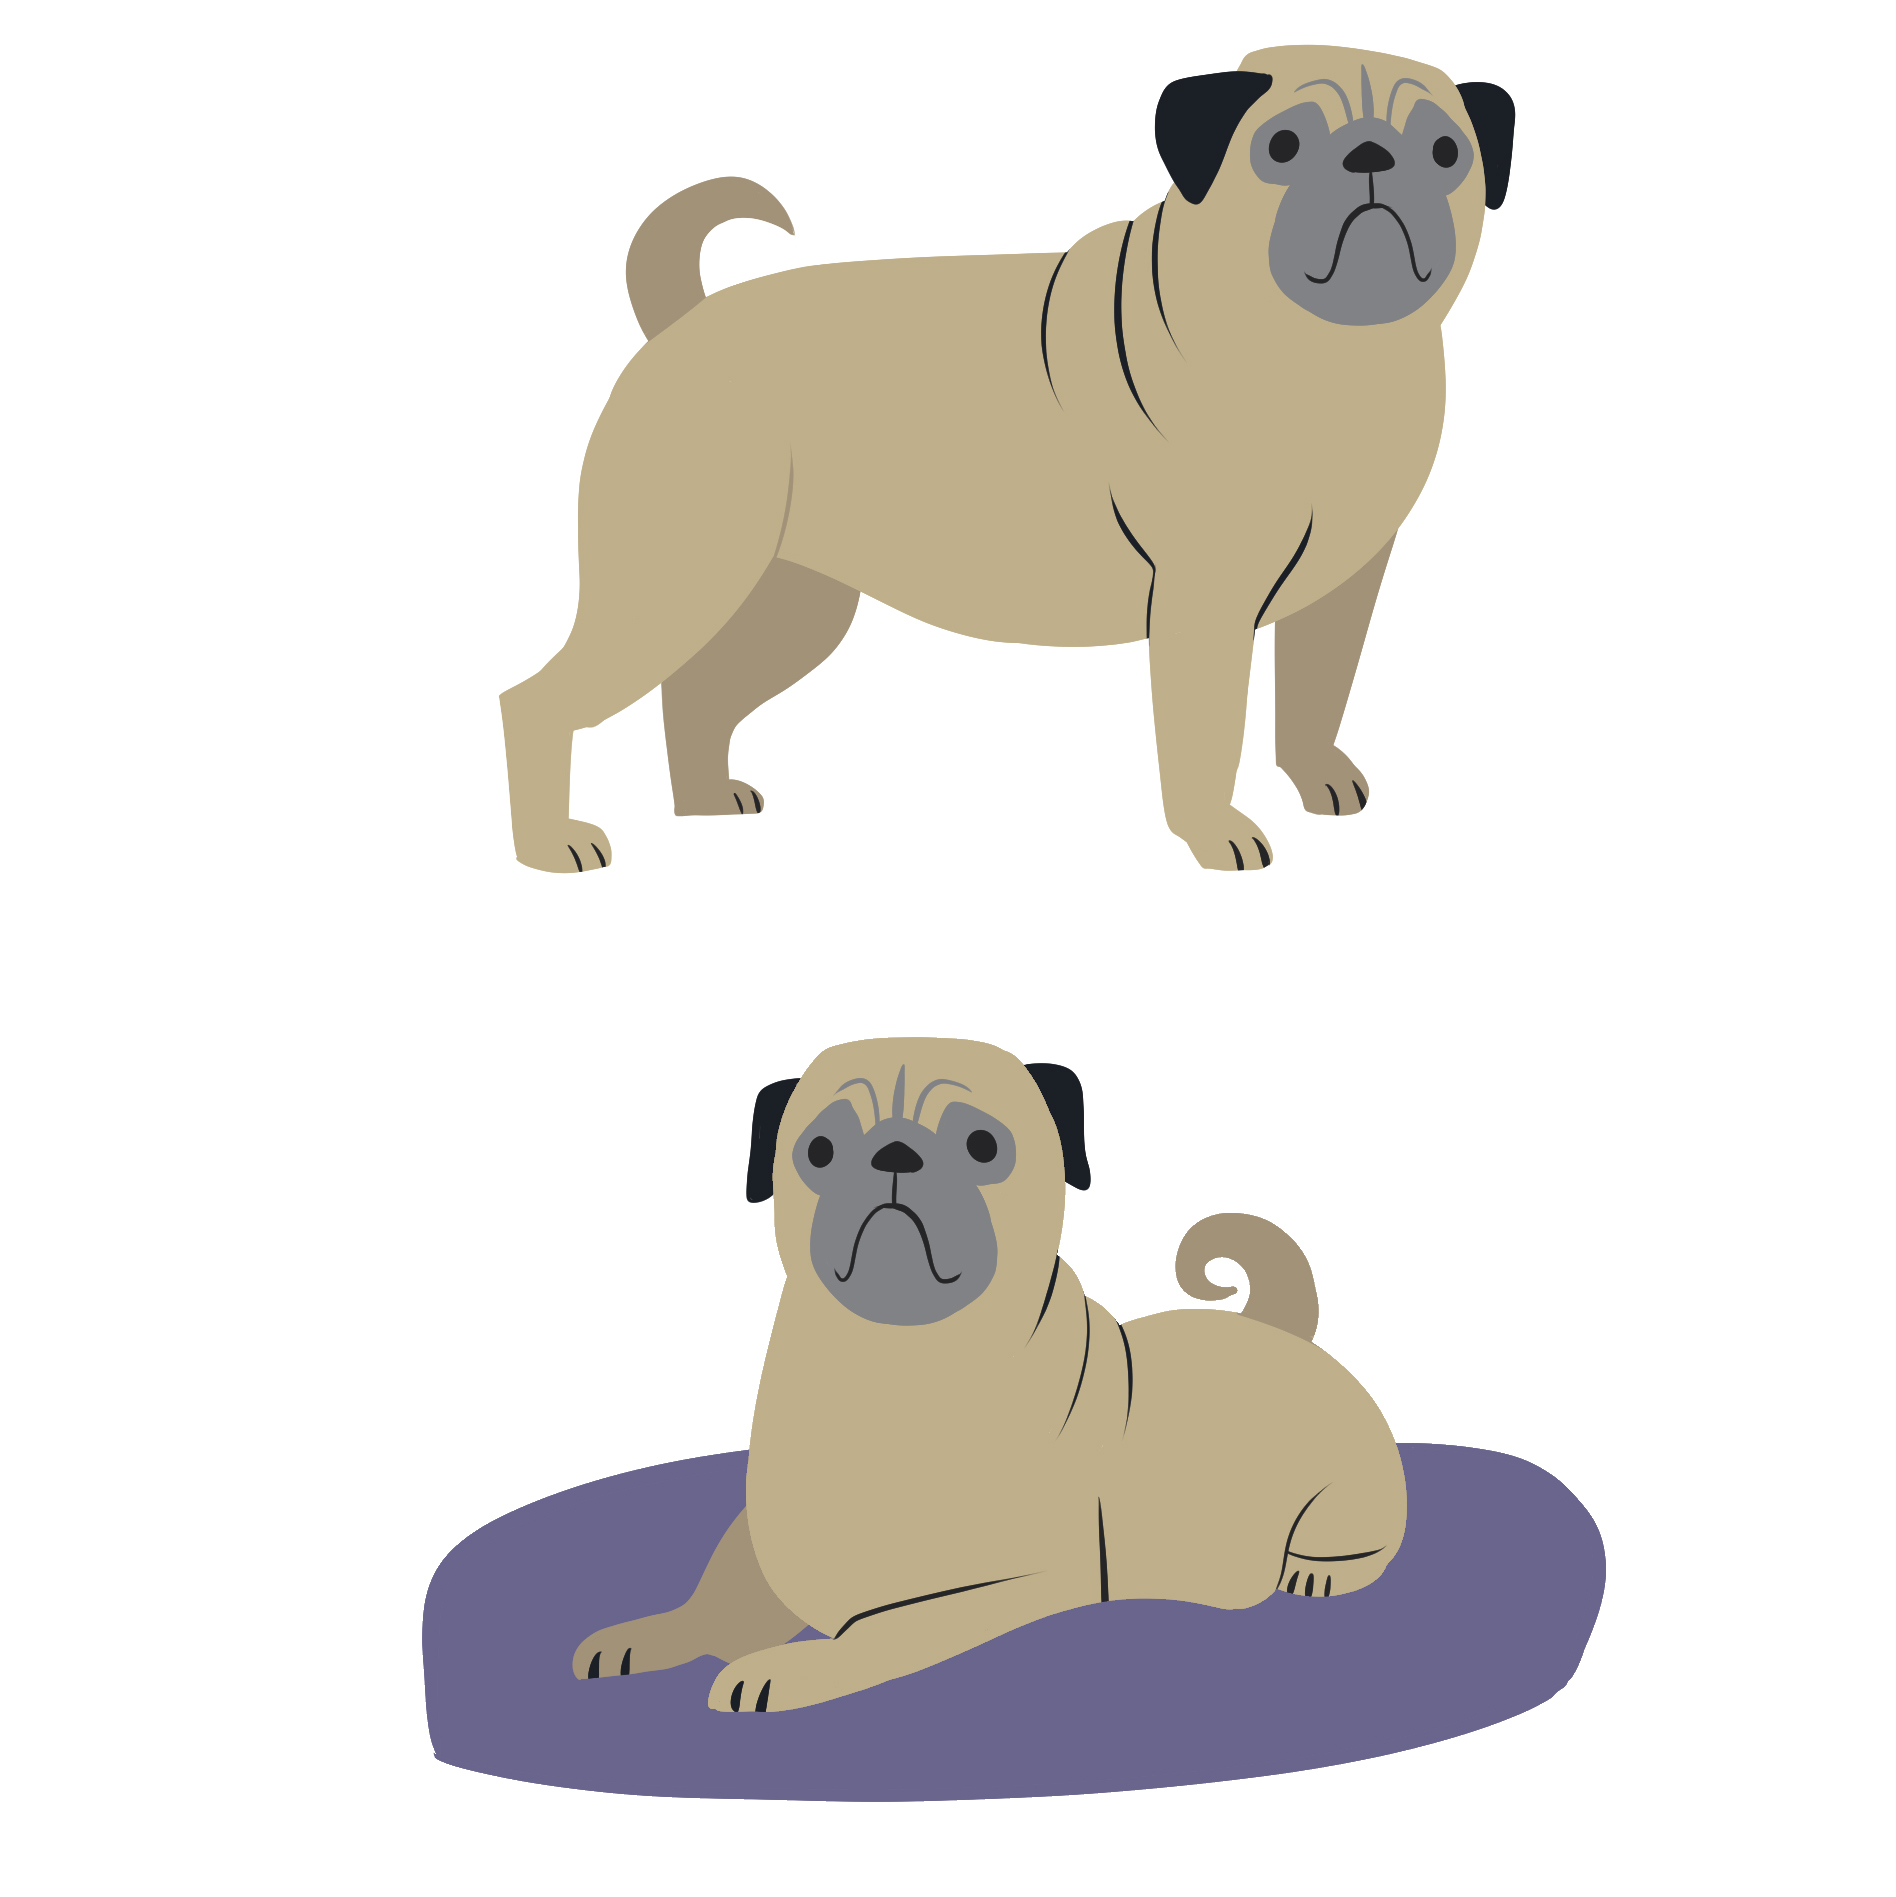 C21 bts12 Spot05 12 dog